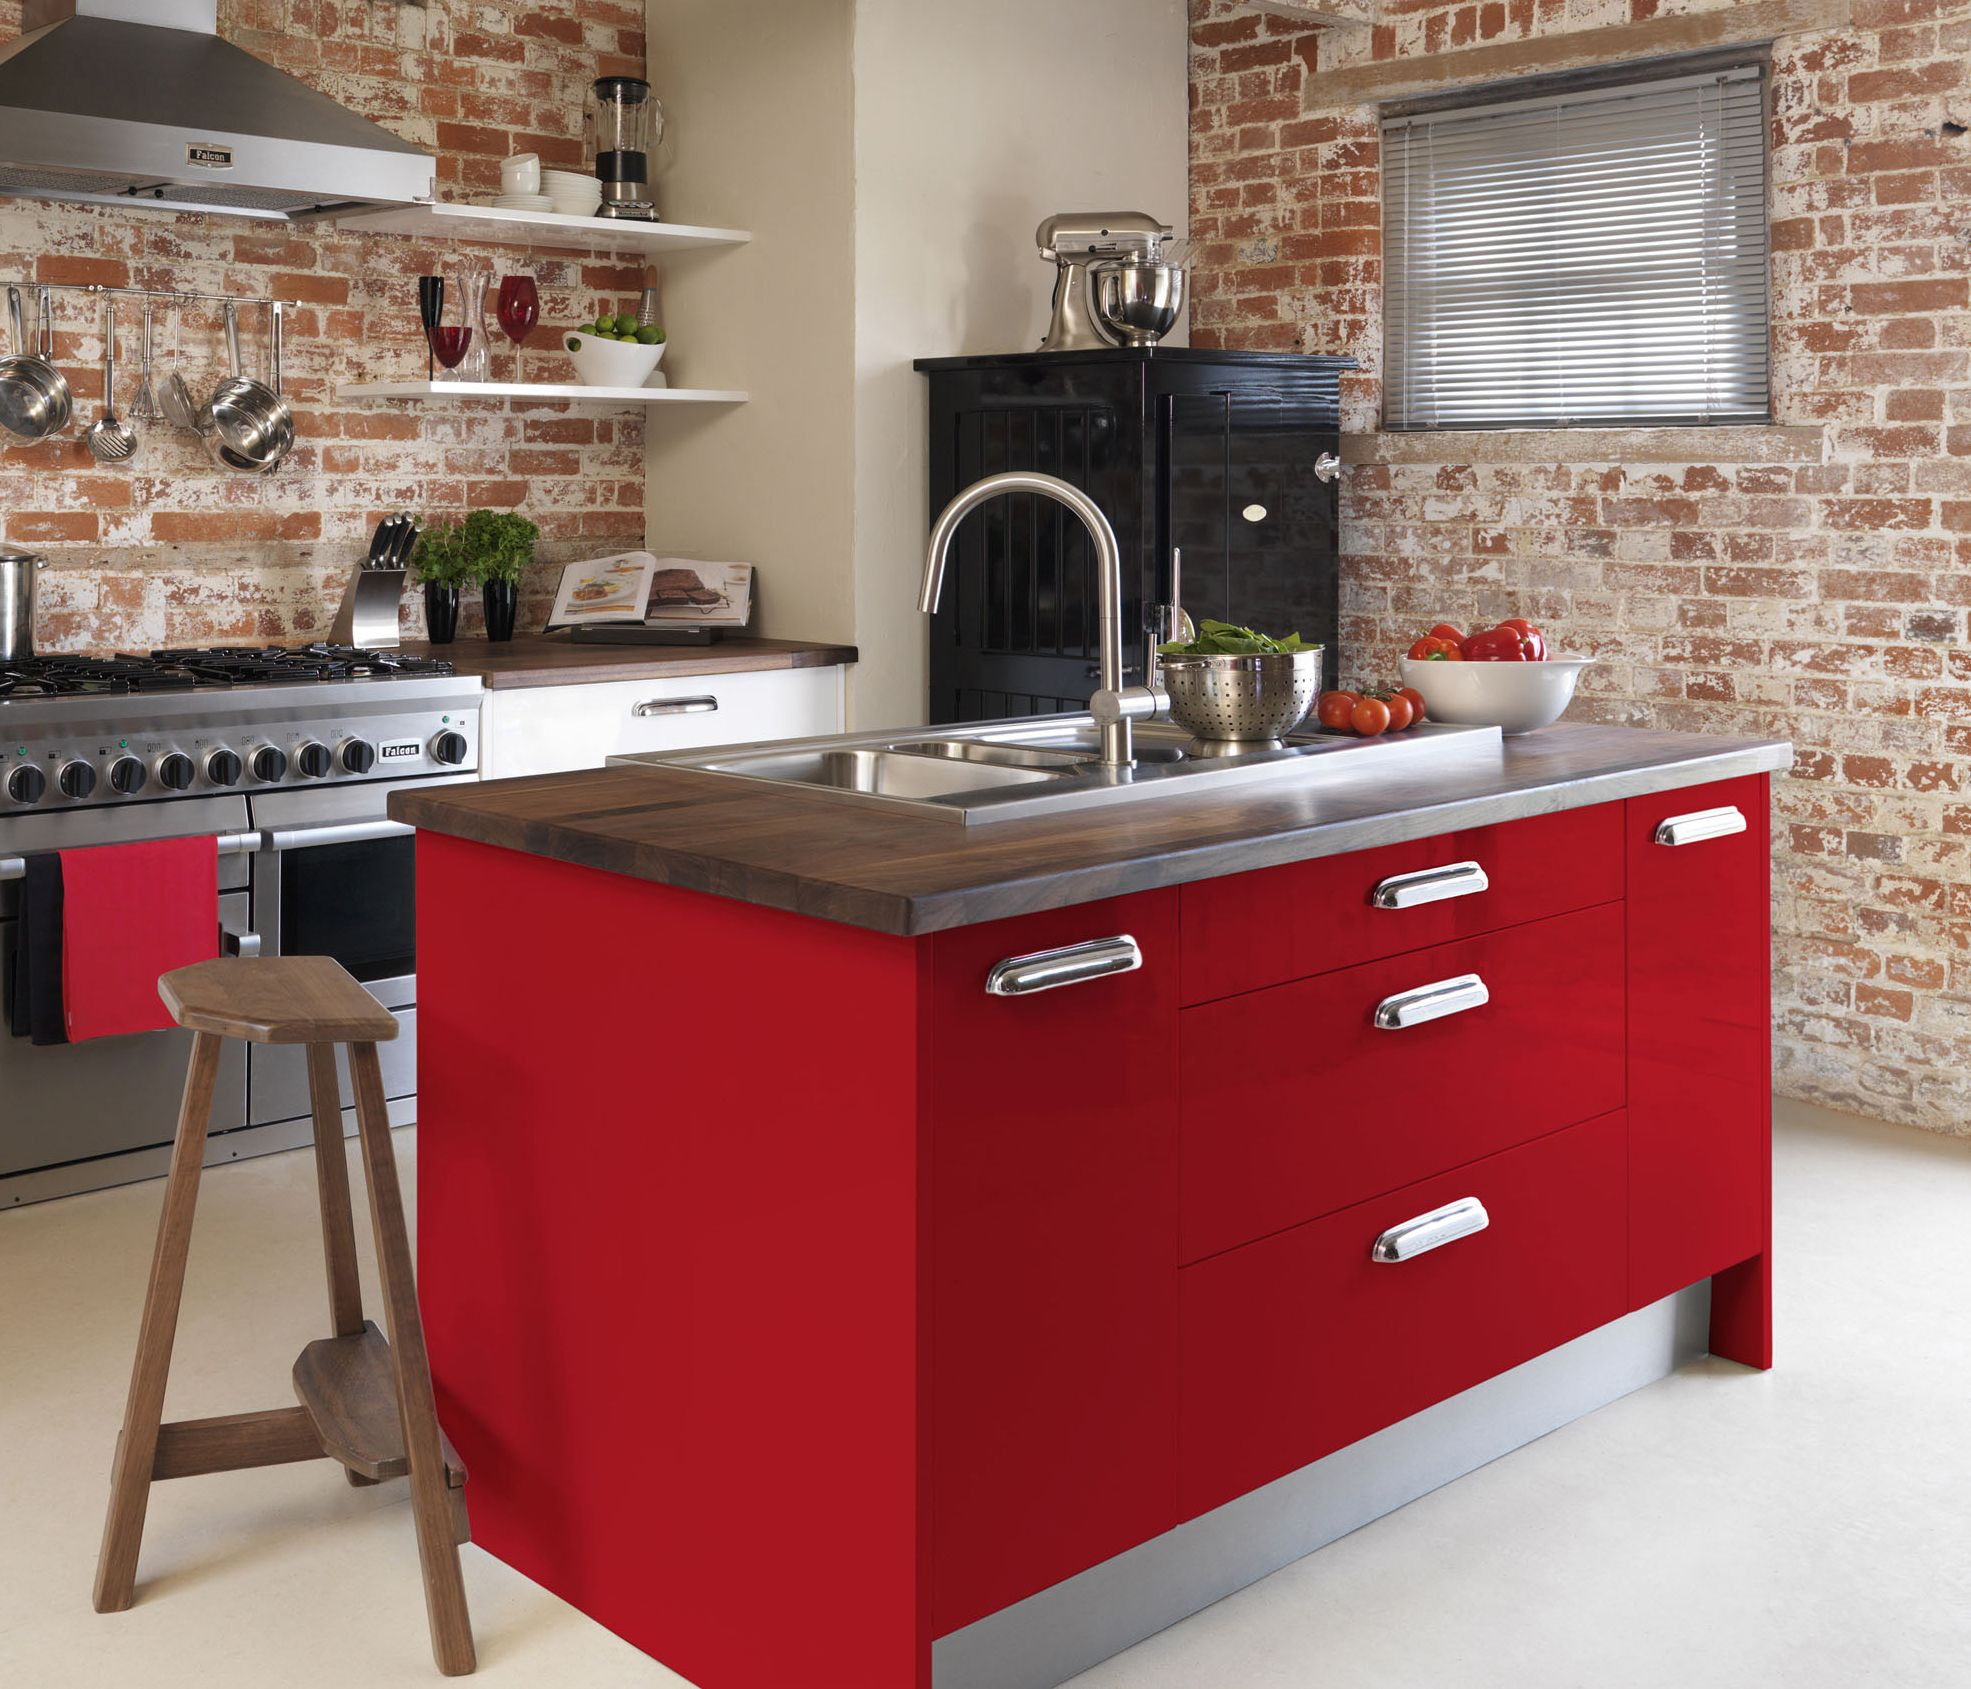 Black Red And Metallic Kitchen Design  Google